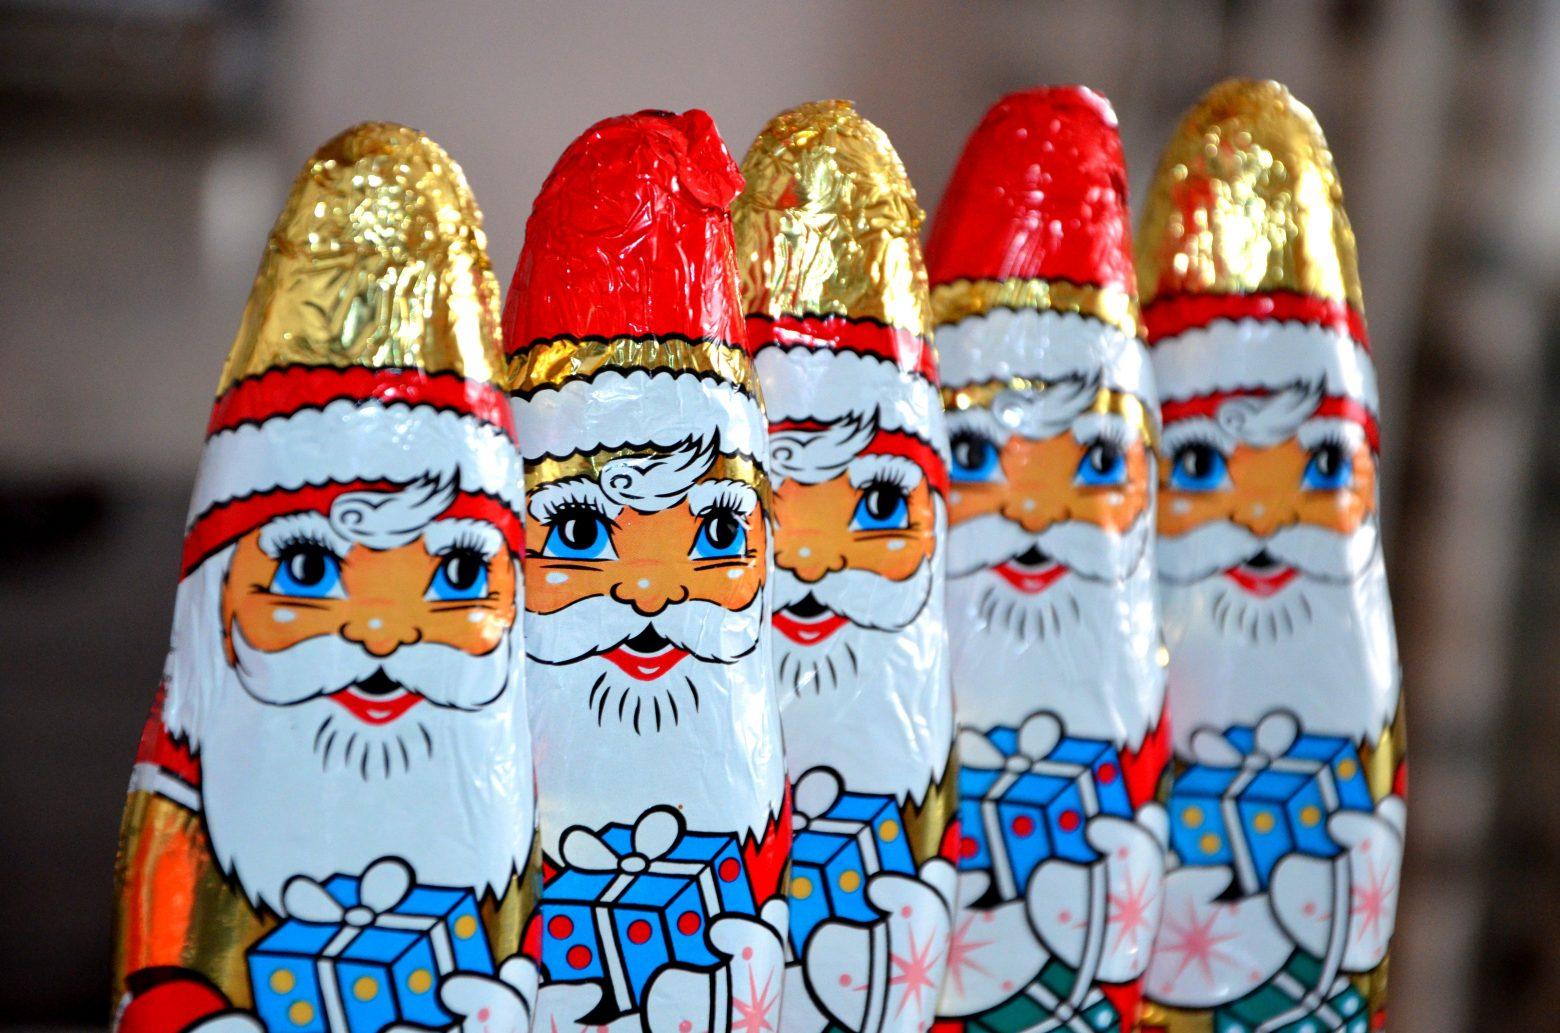 chocolate-santa-claus-490825